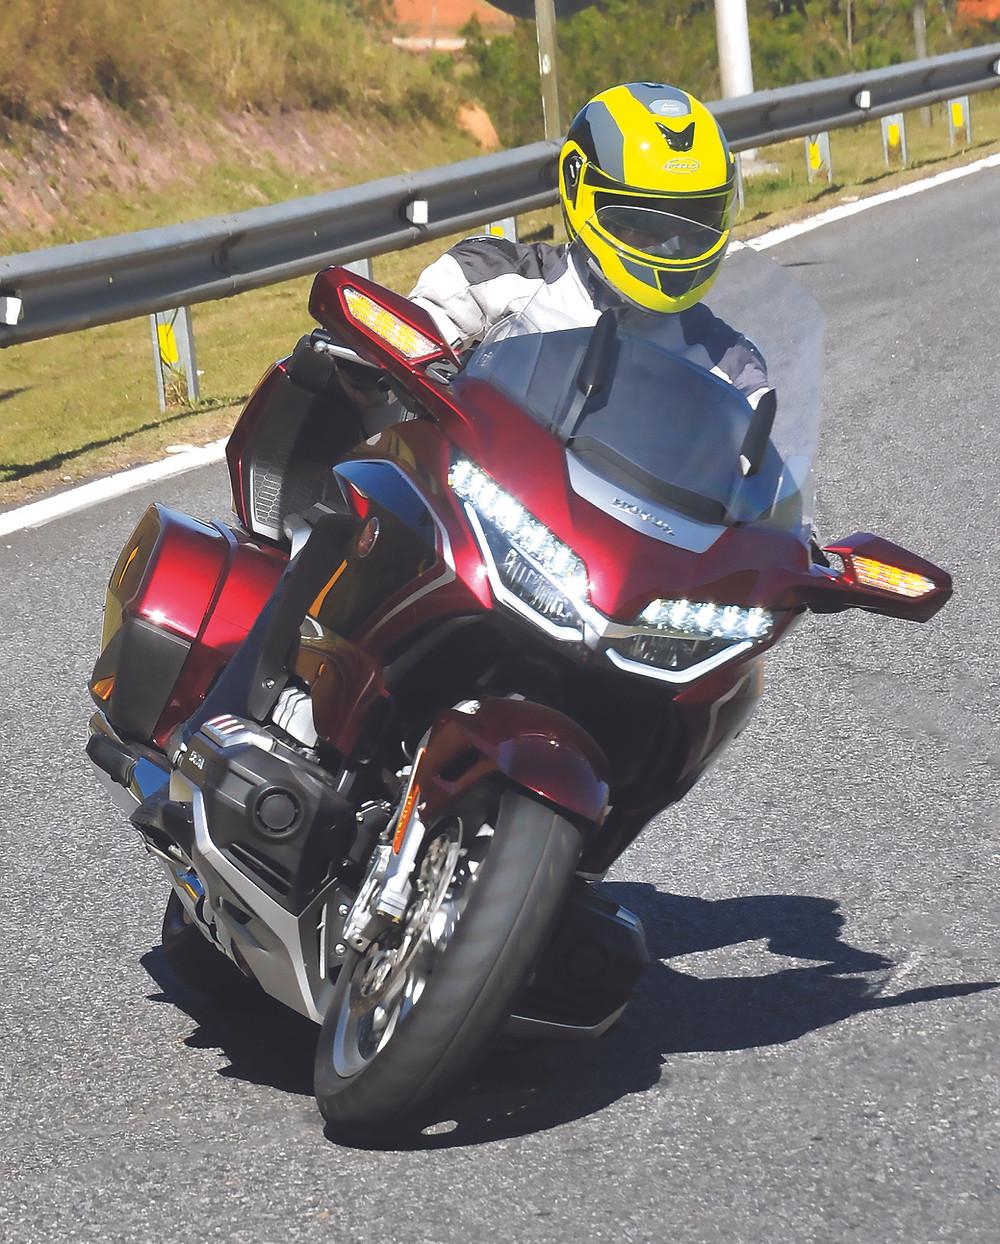 Frente da Honda GoldWing Tour DCT